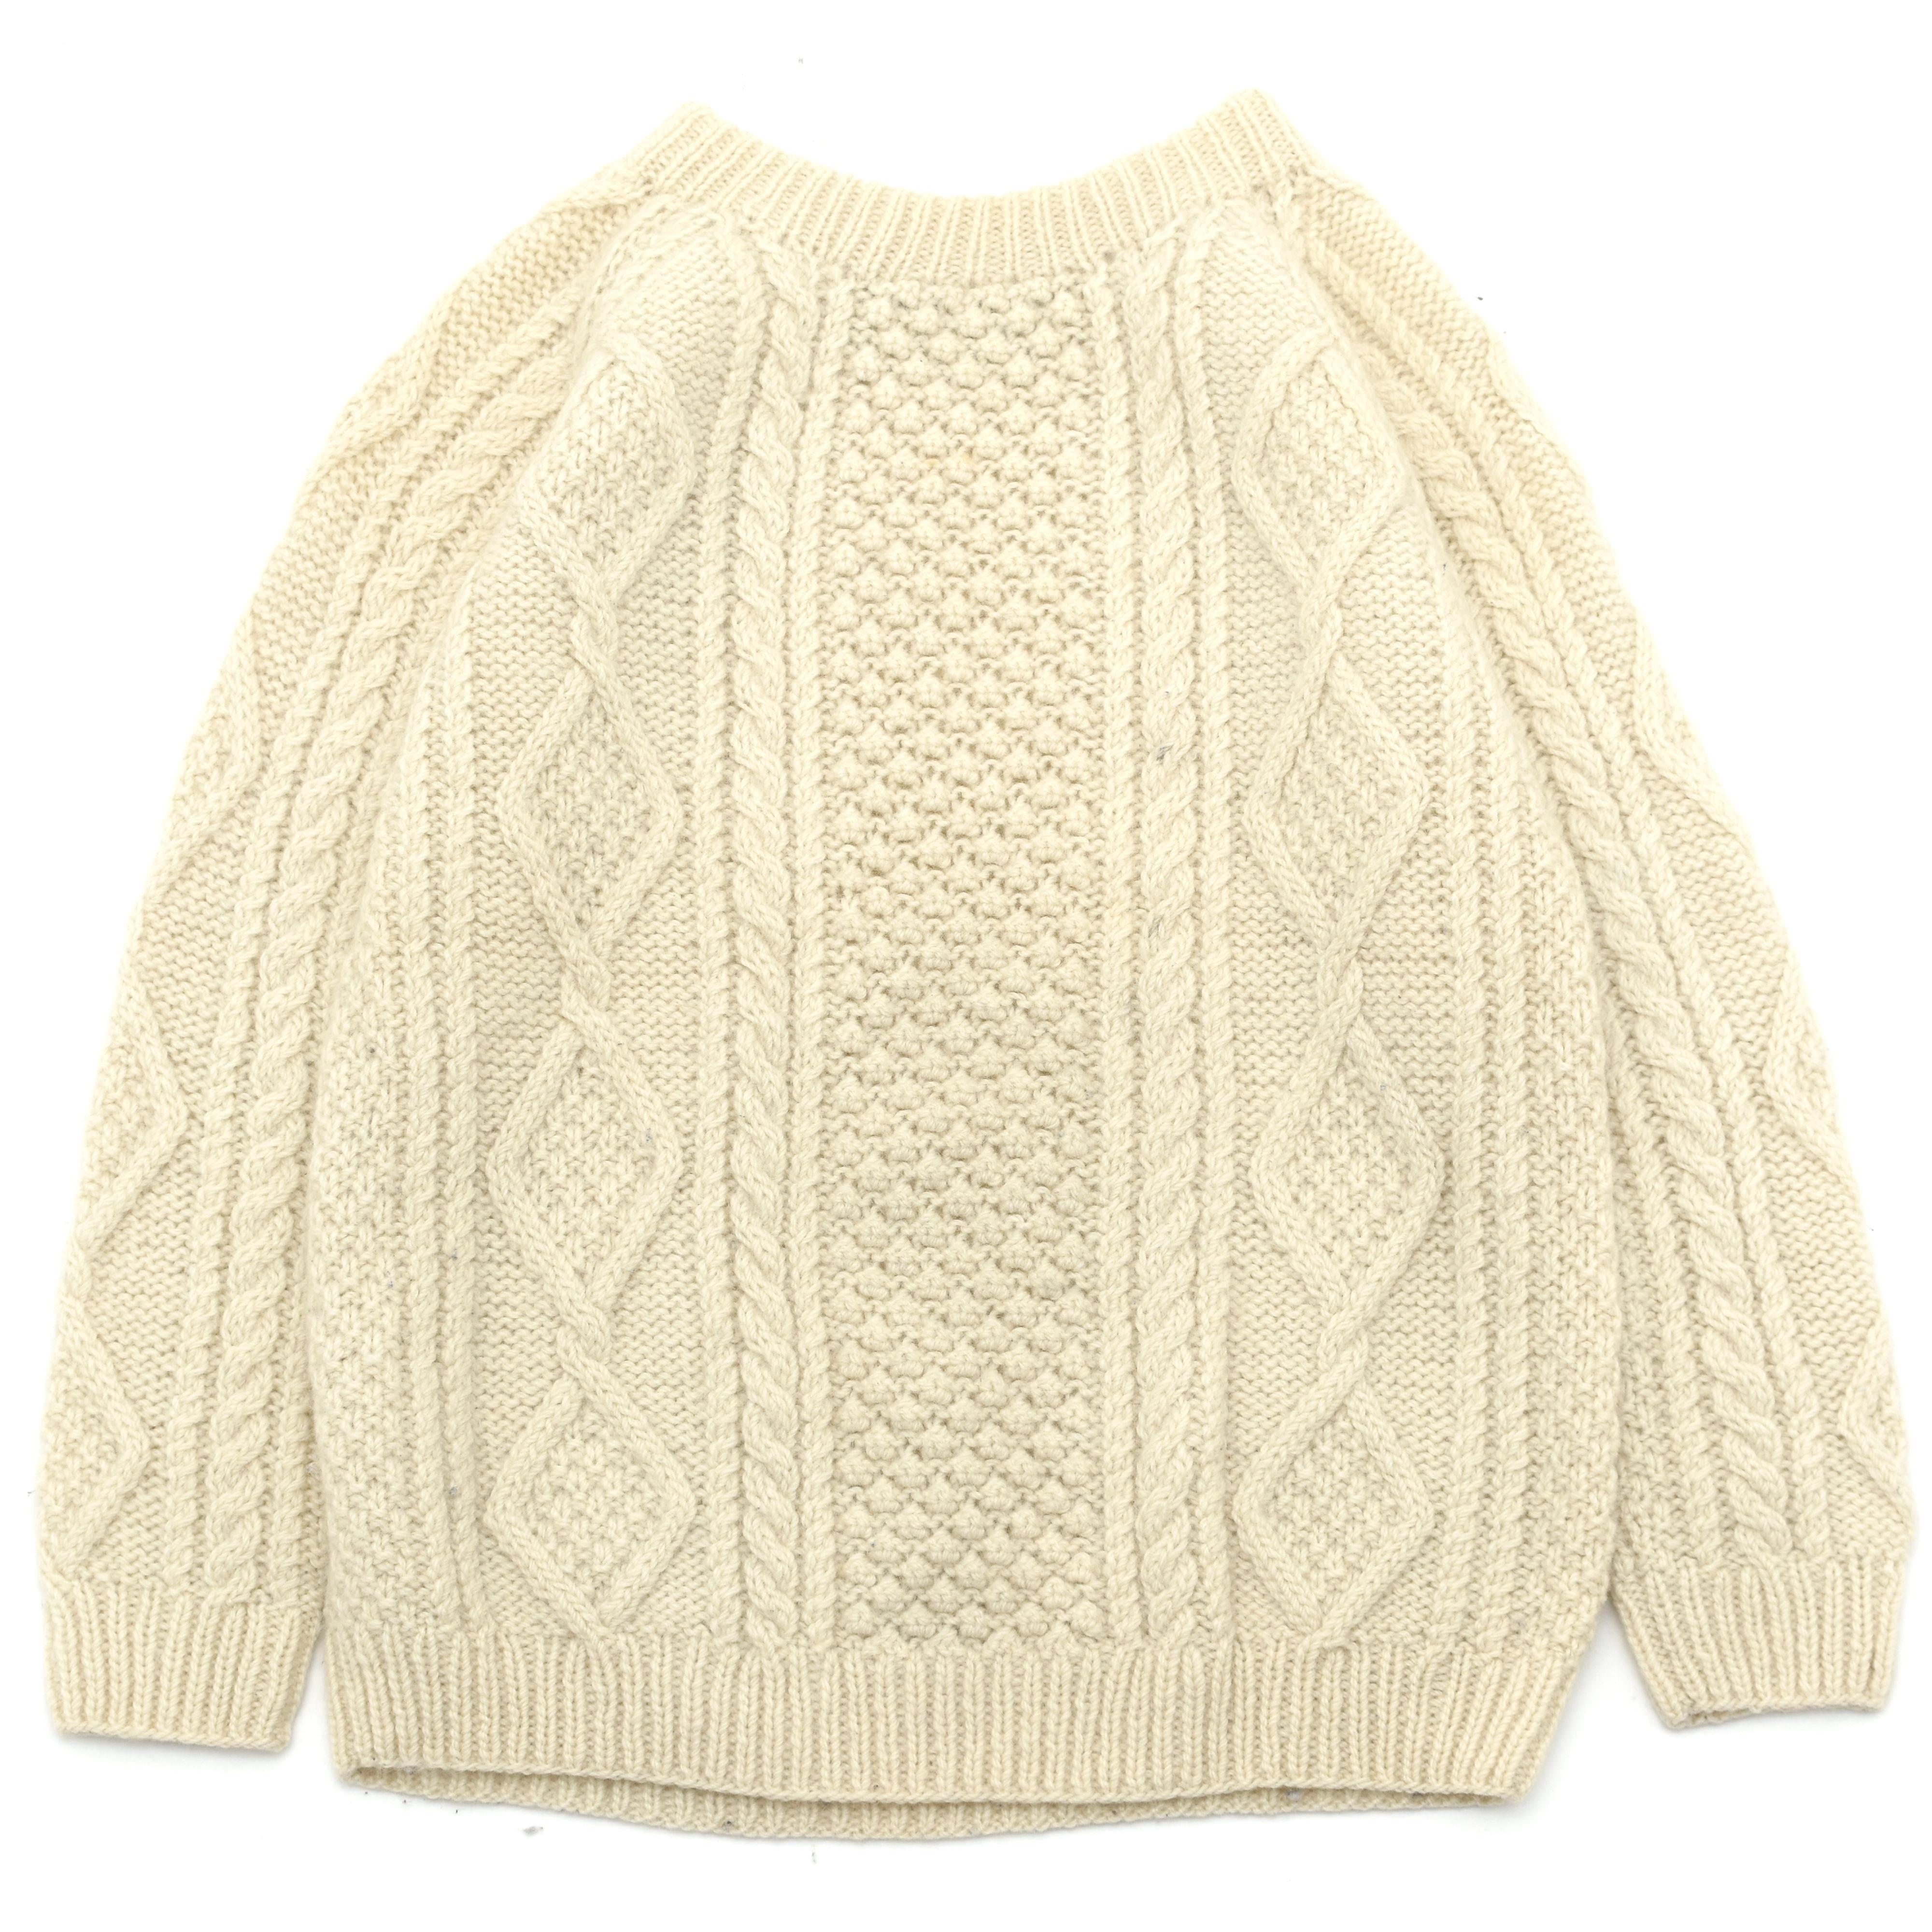 Hand Knit Aran Sweater Made UK